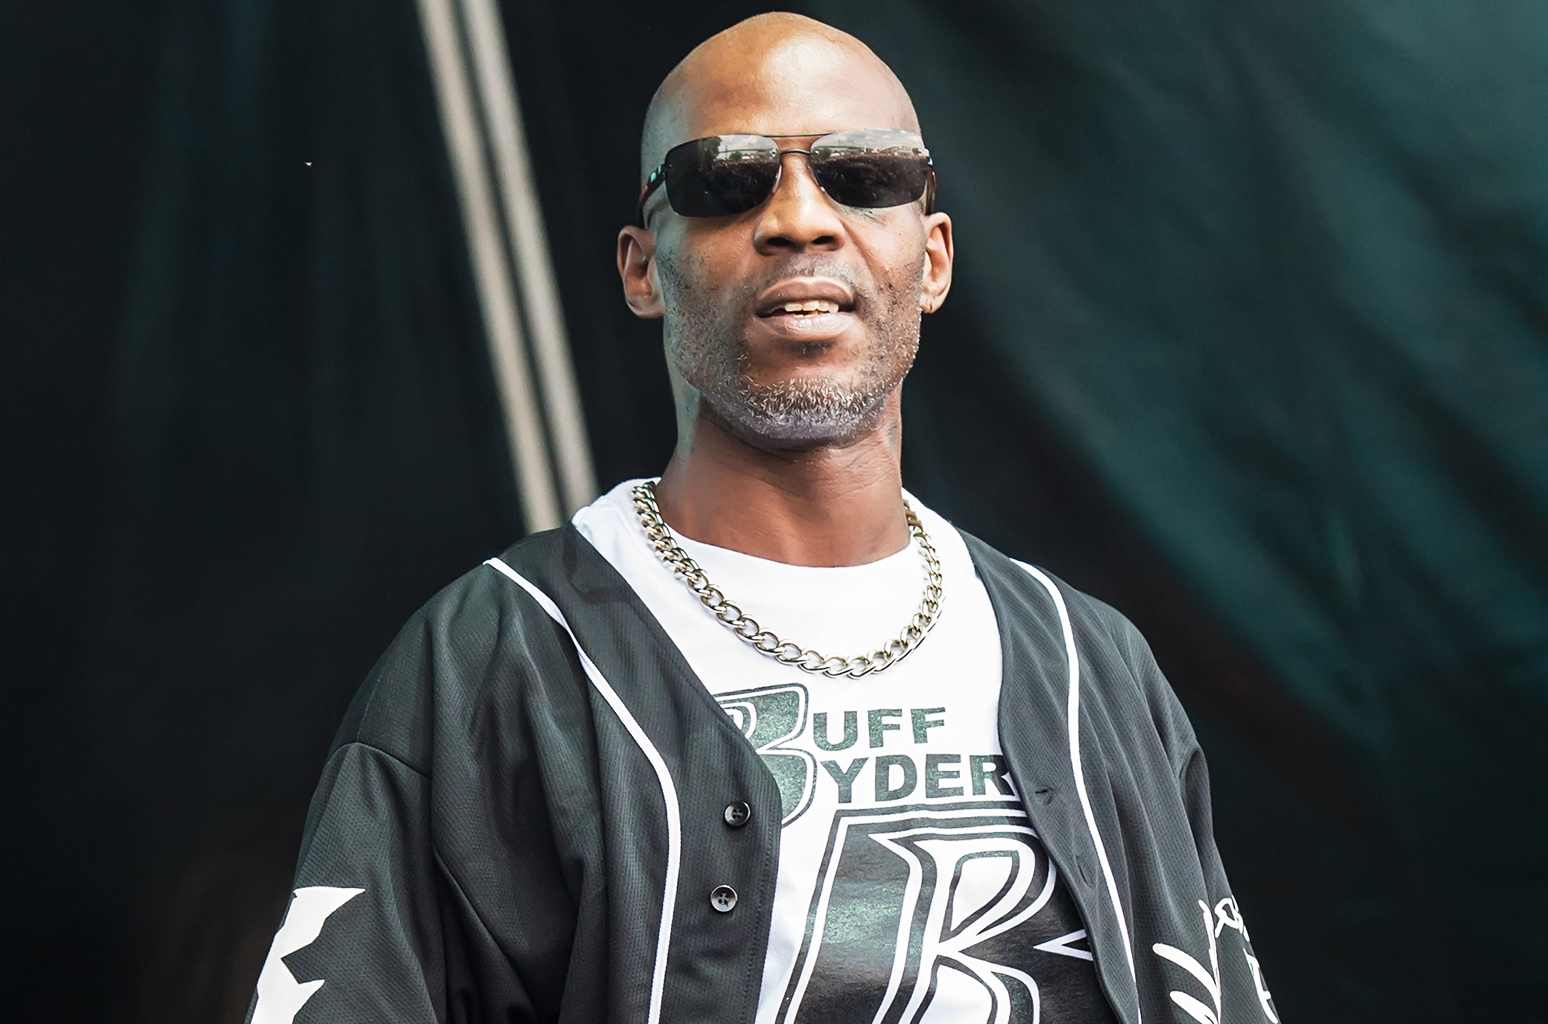 Rakim, DMX & The LOX Keep the Old School Flavor Alive at Brooklyn's Hip-Hop Festival